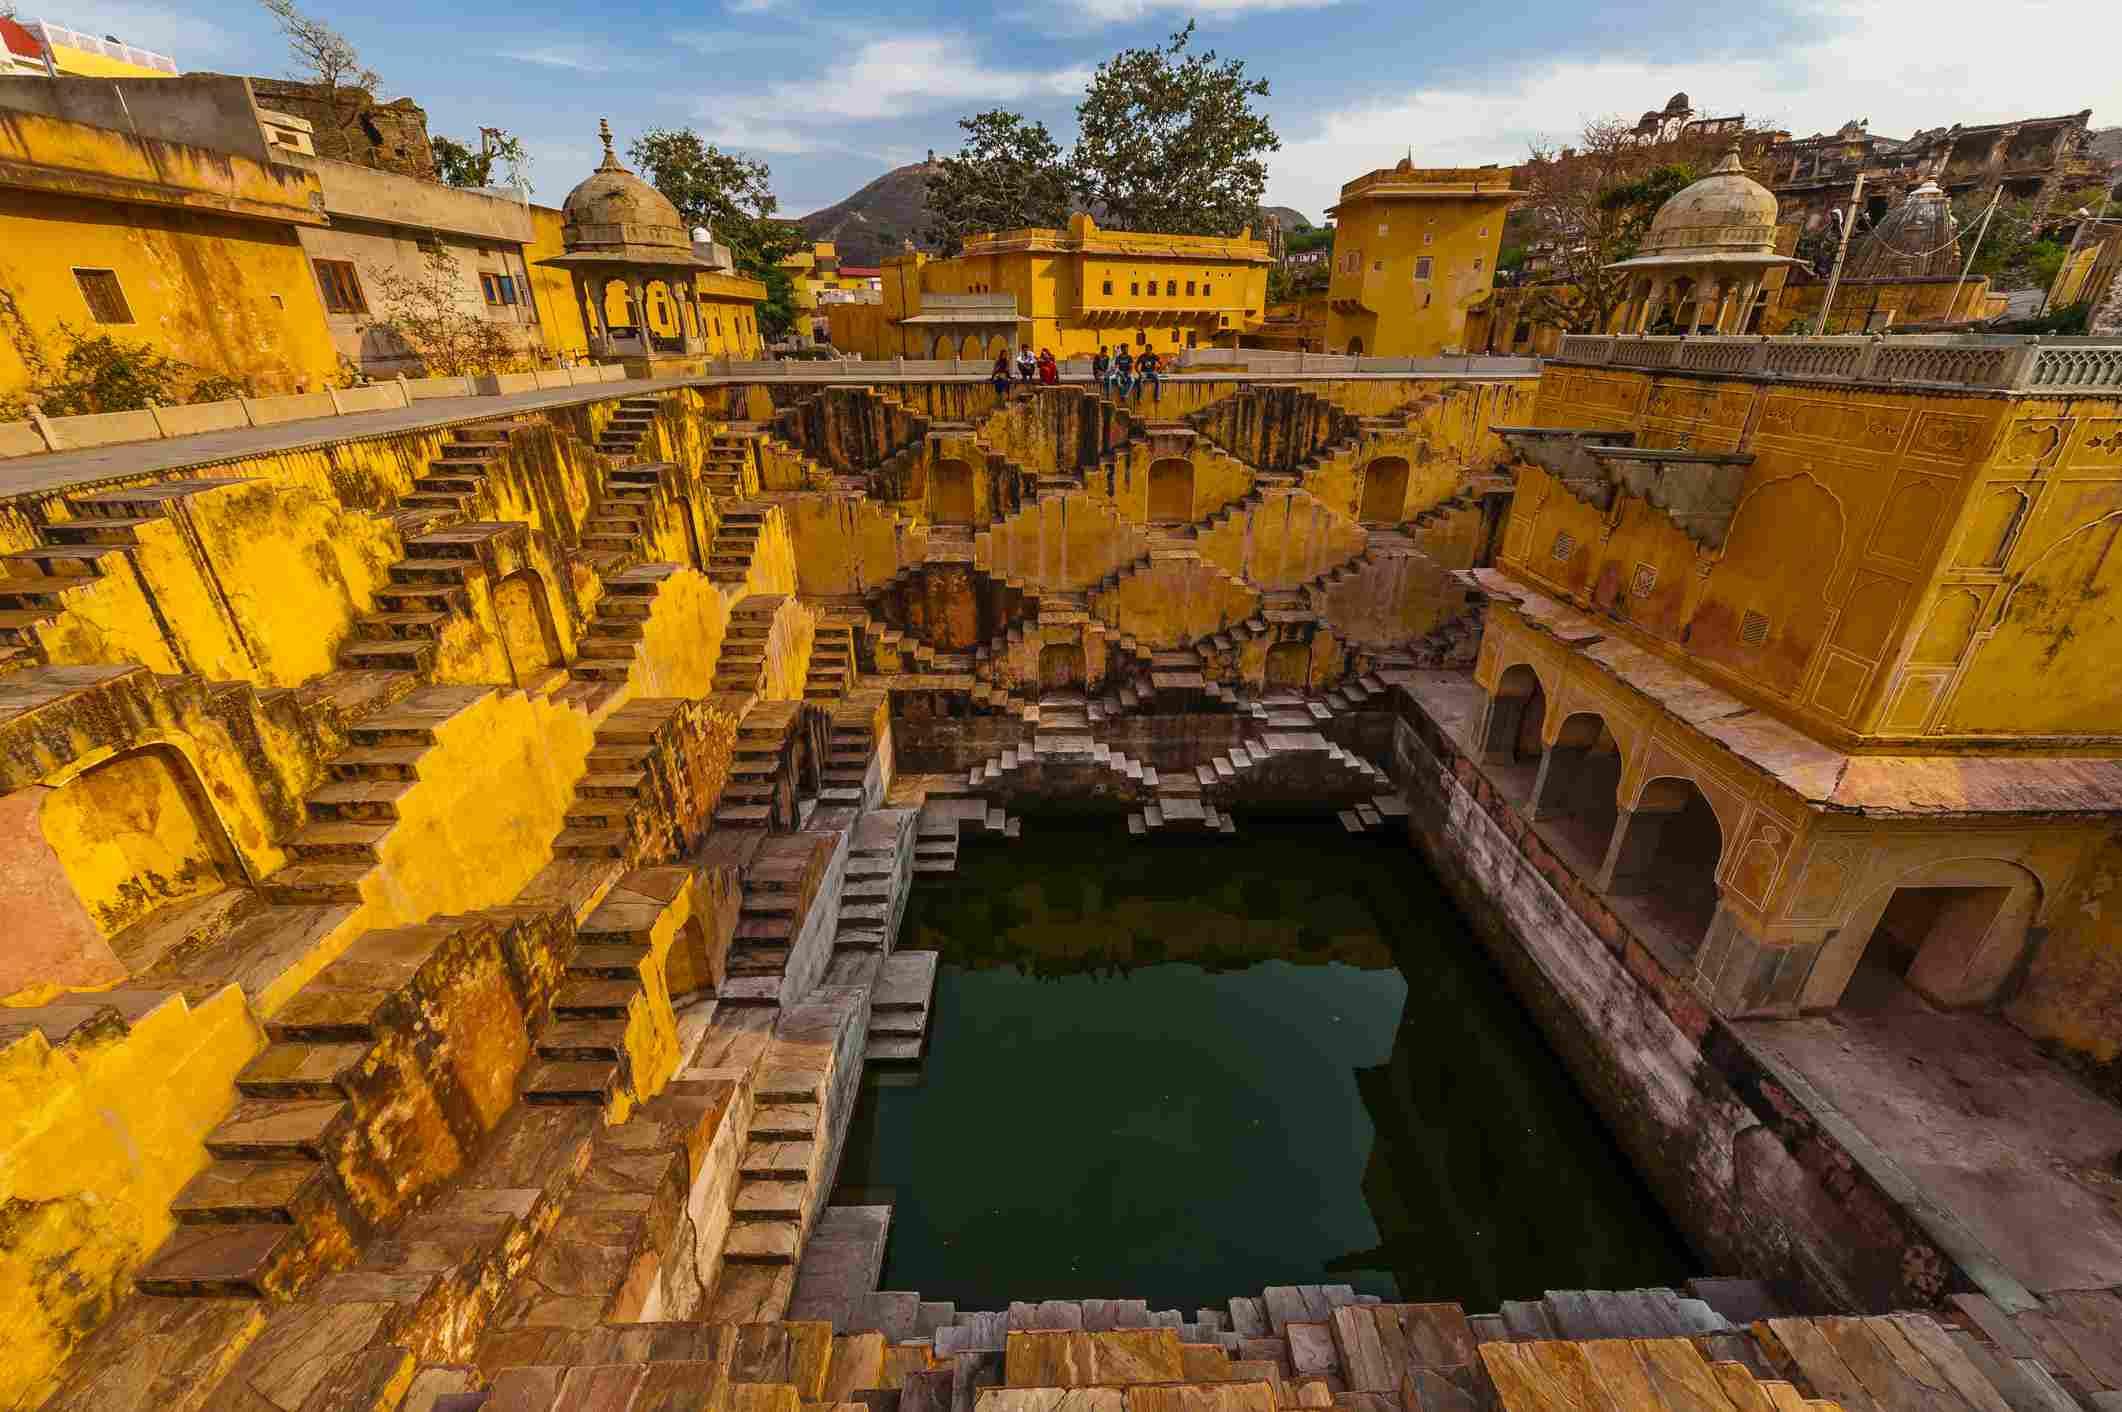 Panna Meena Ka Kund step well, (baori), Amer (near Jaipur), Rajasthan, India